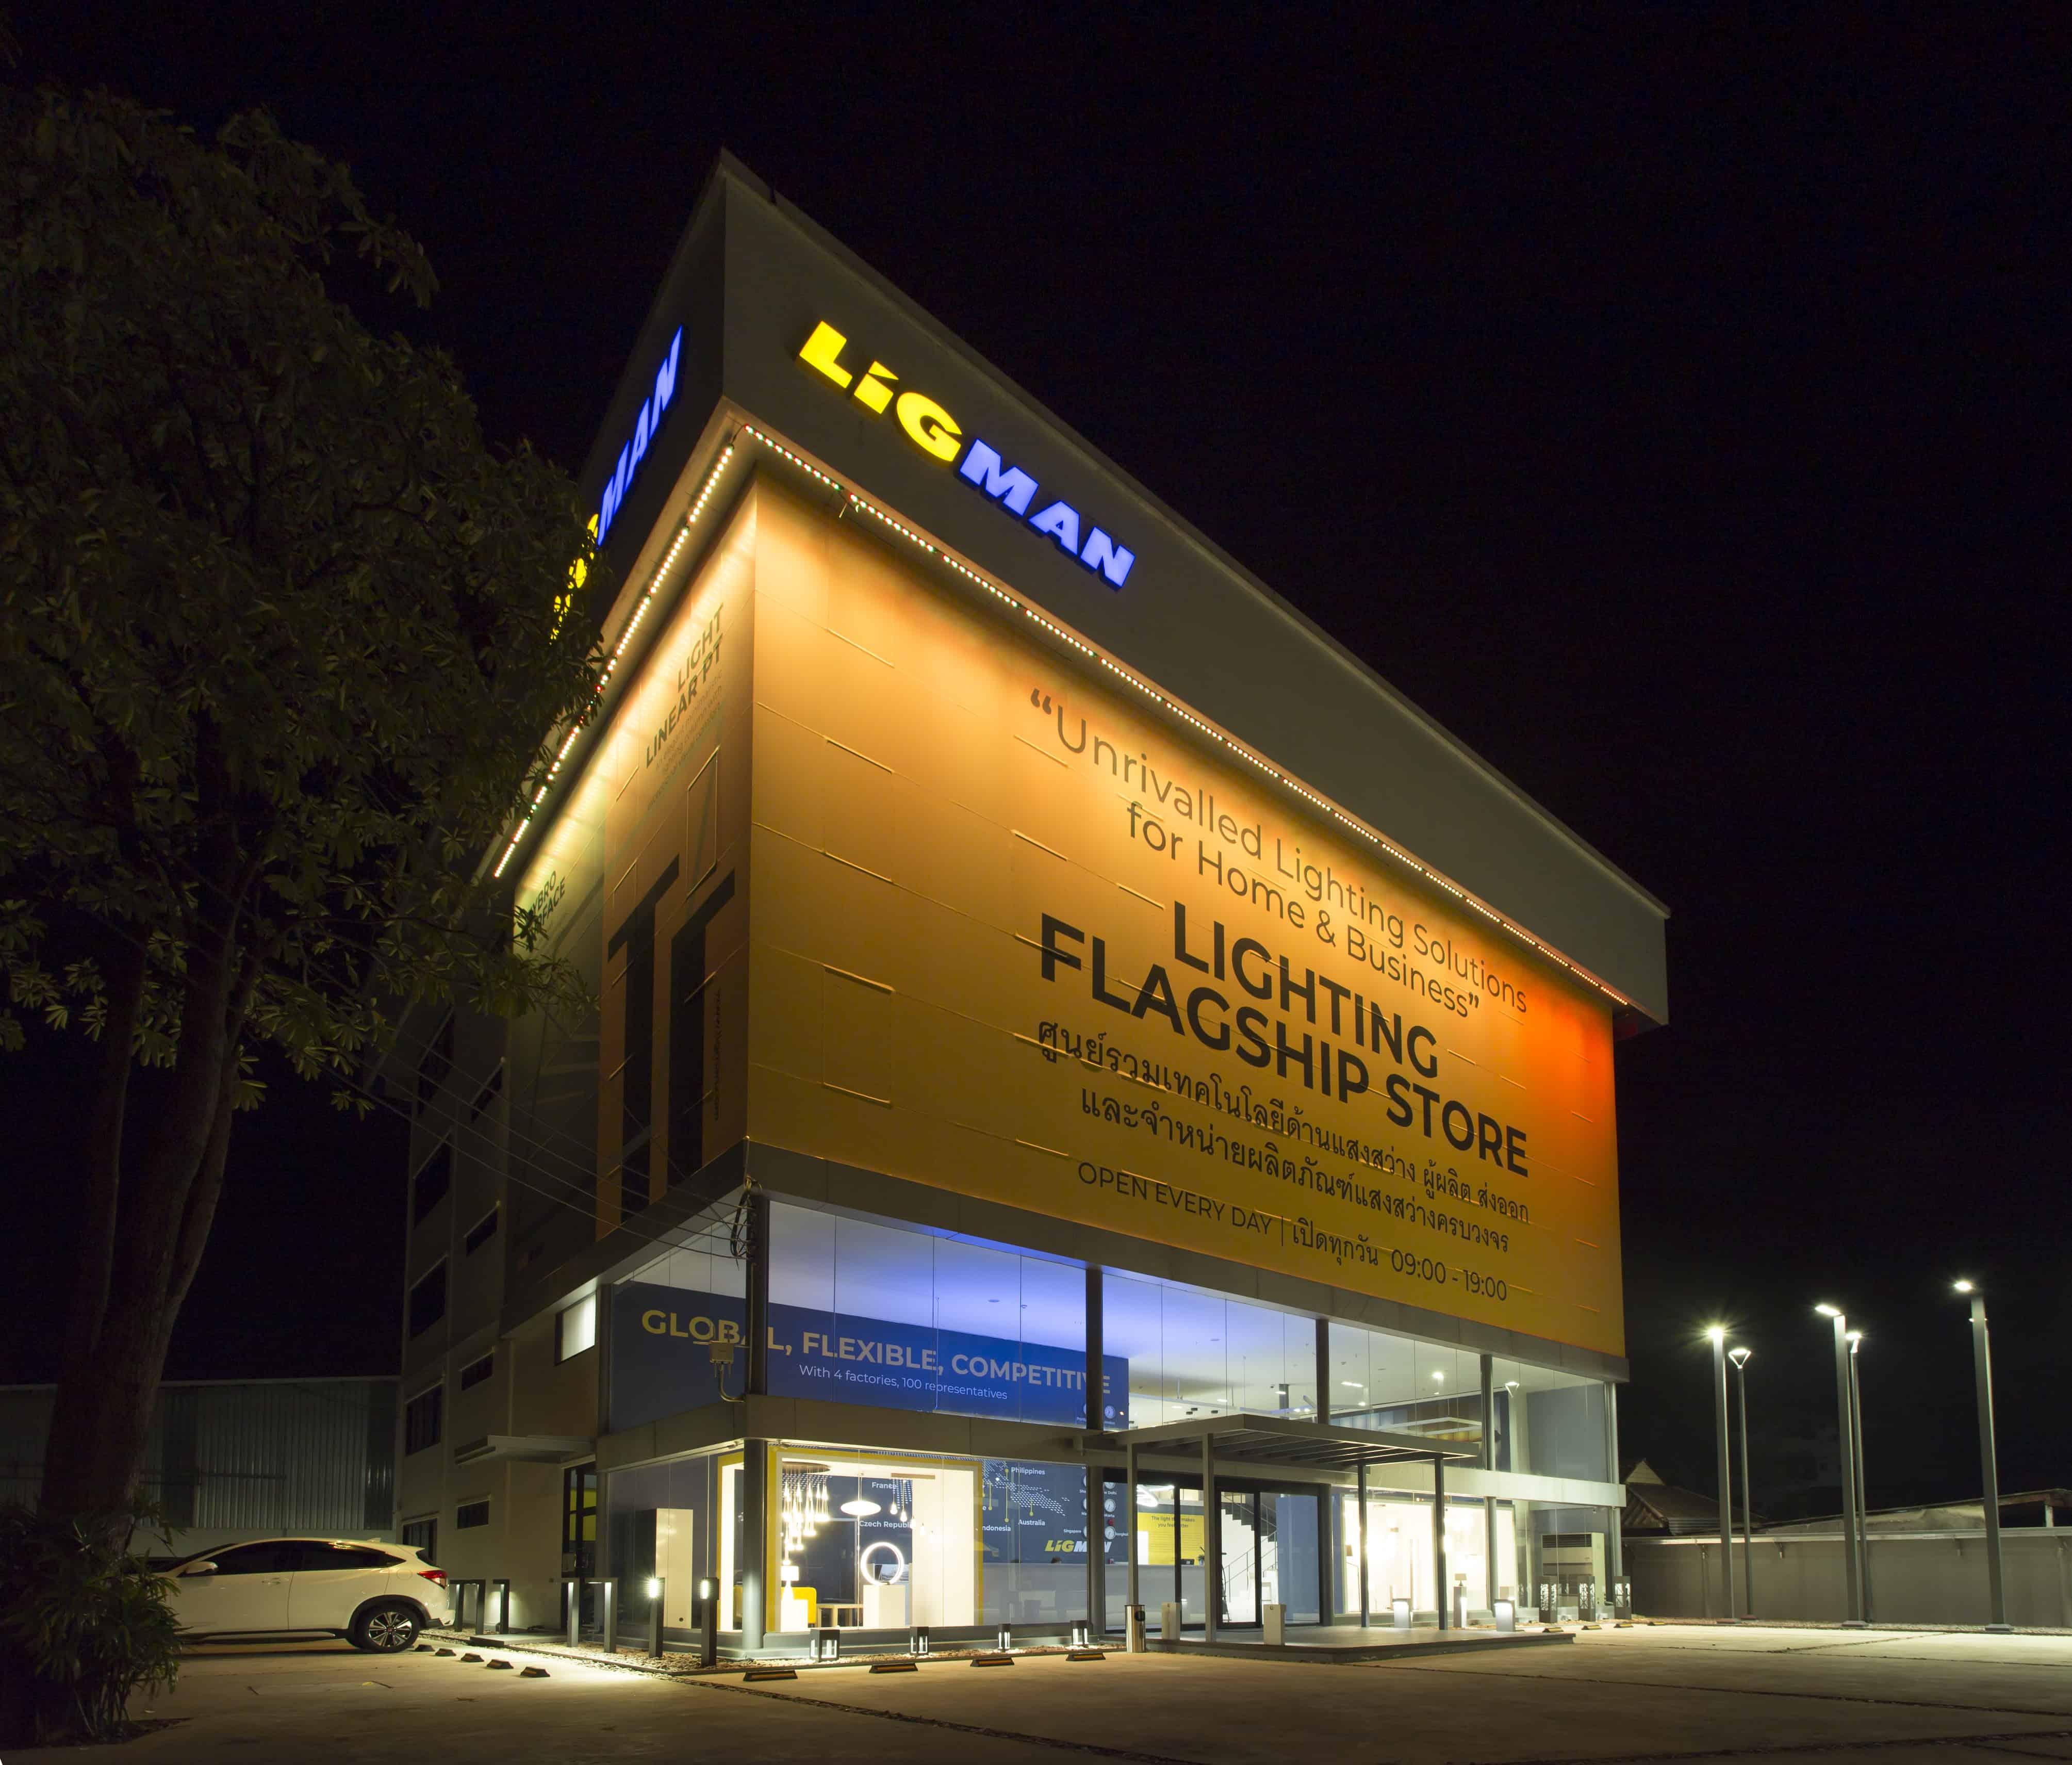 LIGMAN Flagship Store